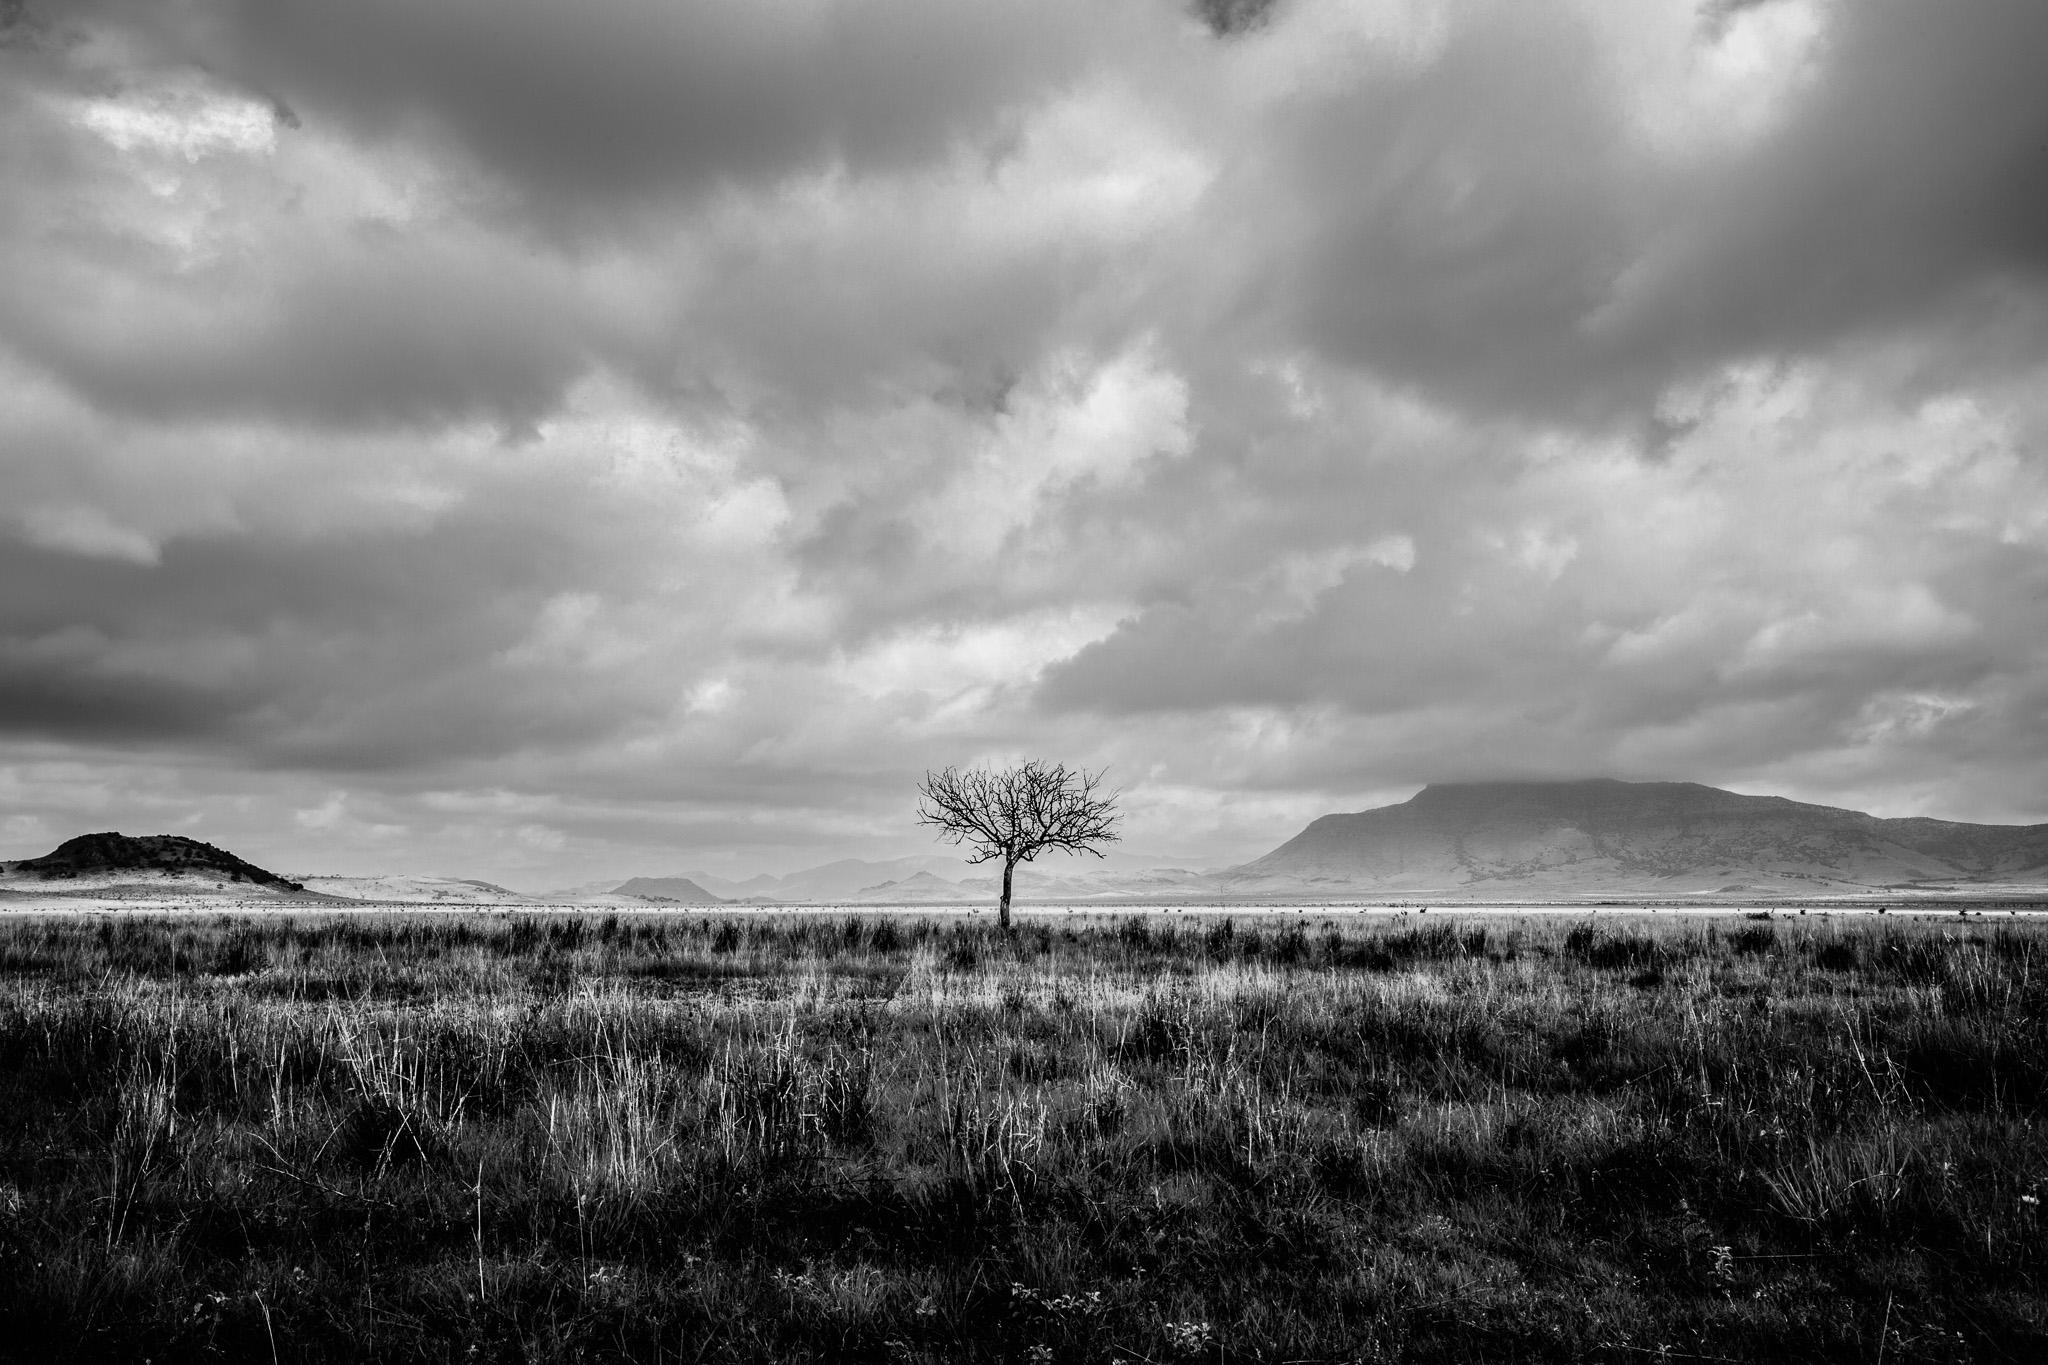 Outside Marfa, Texas - Lone Tree